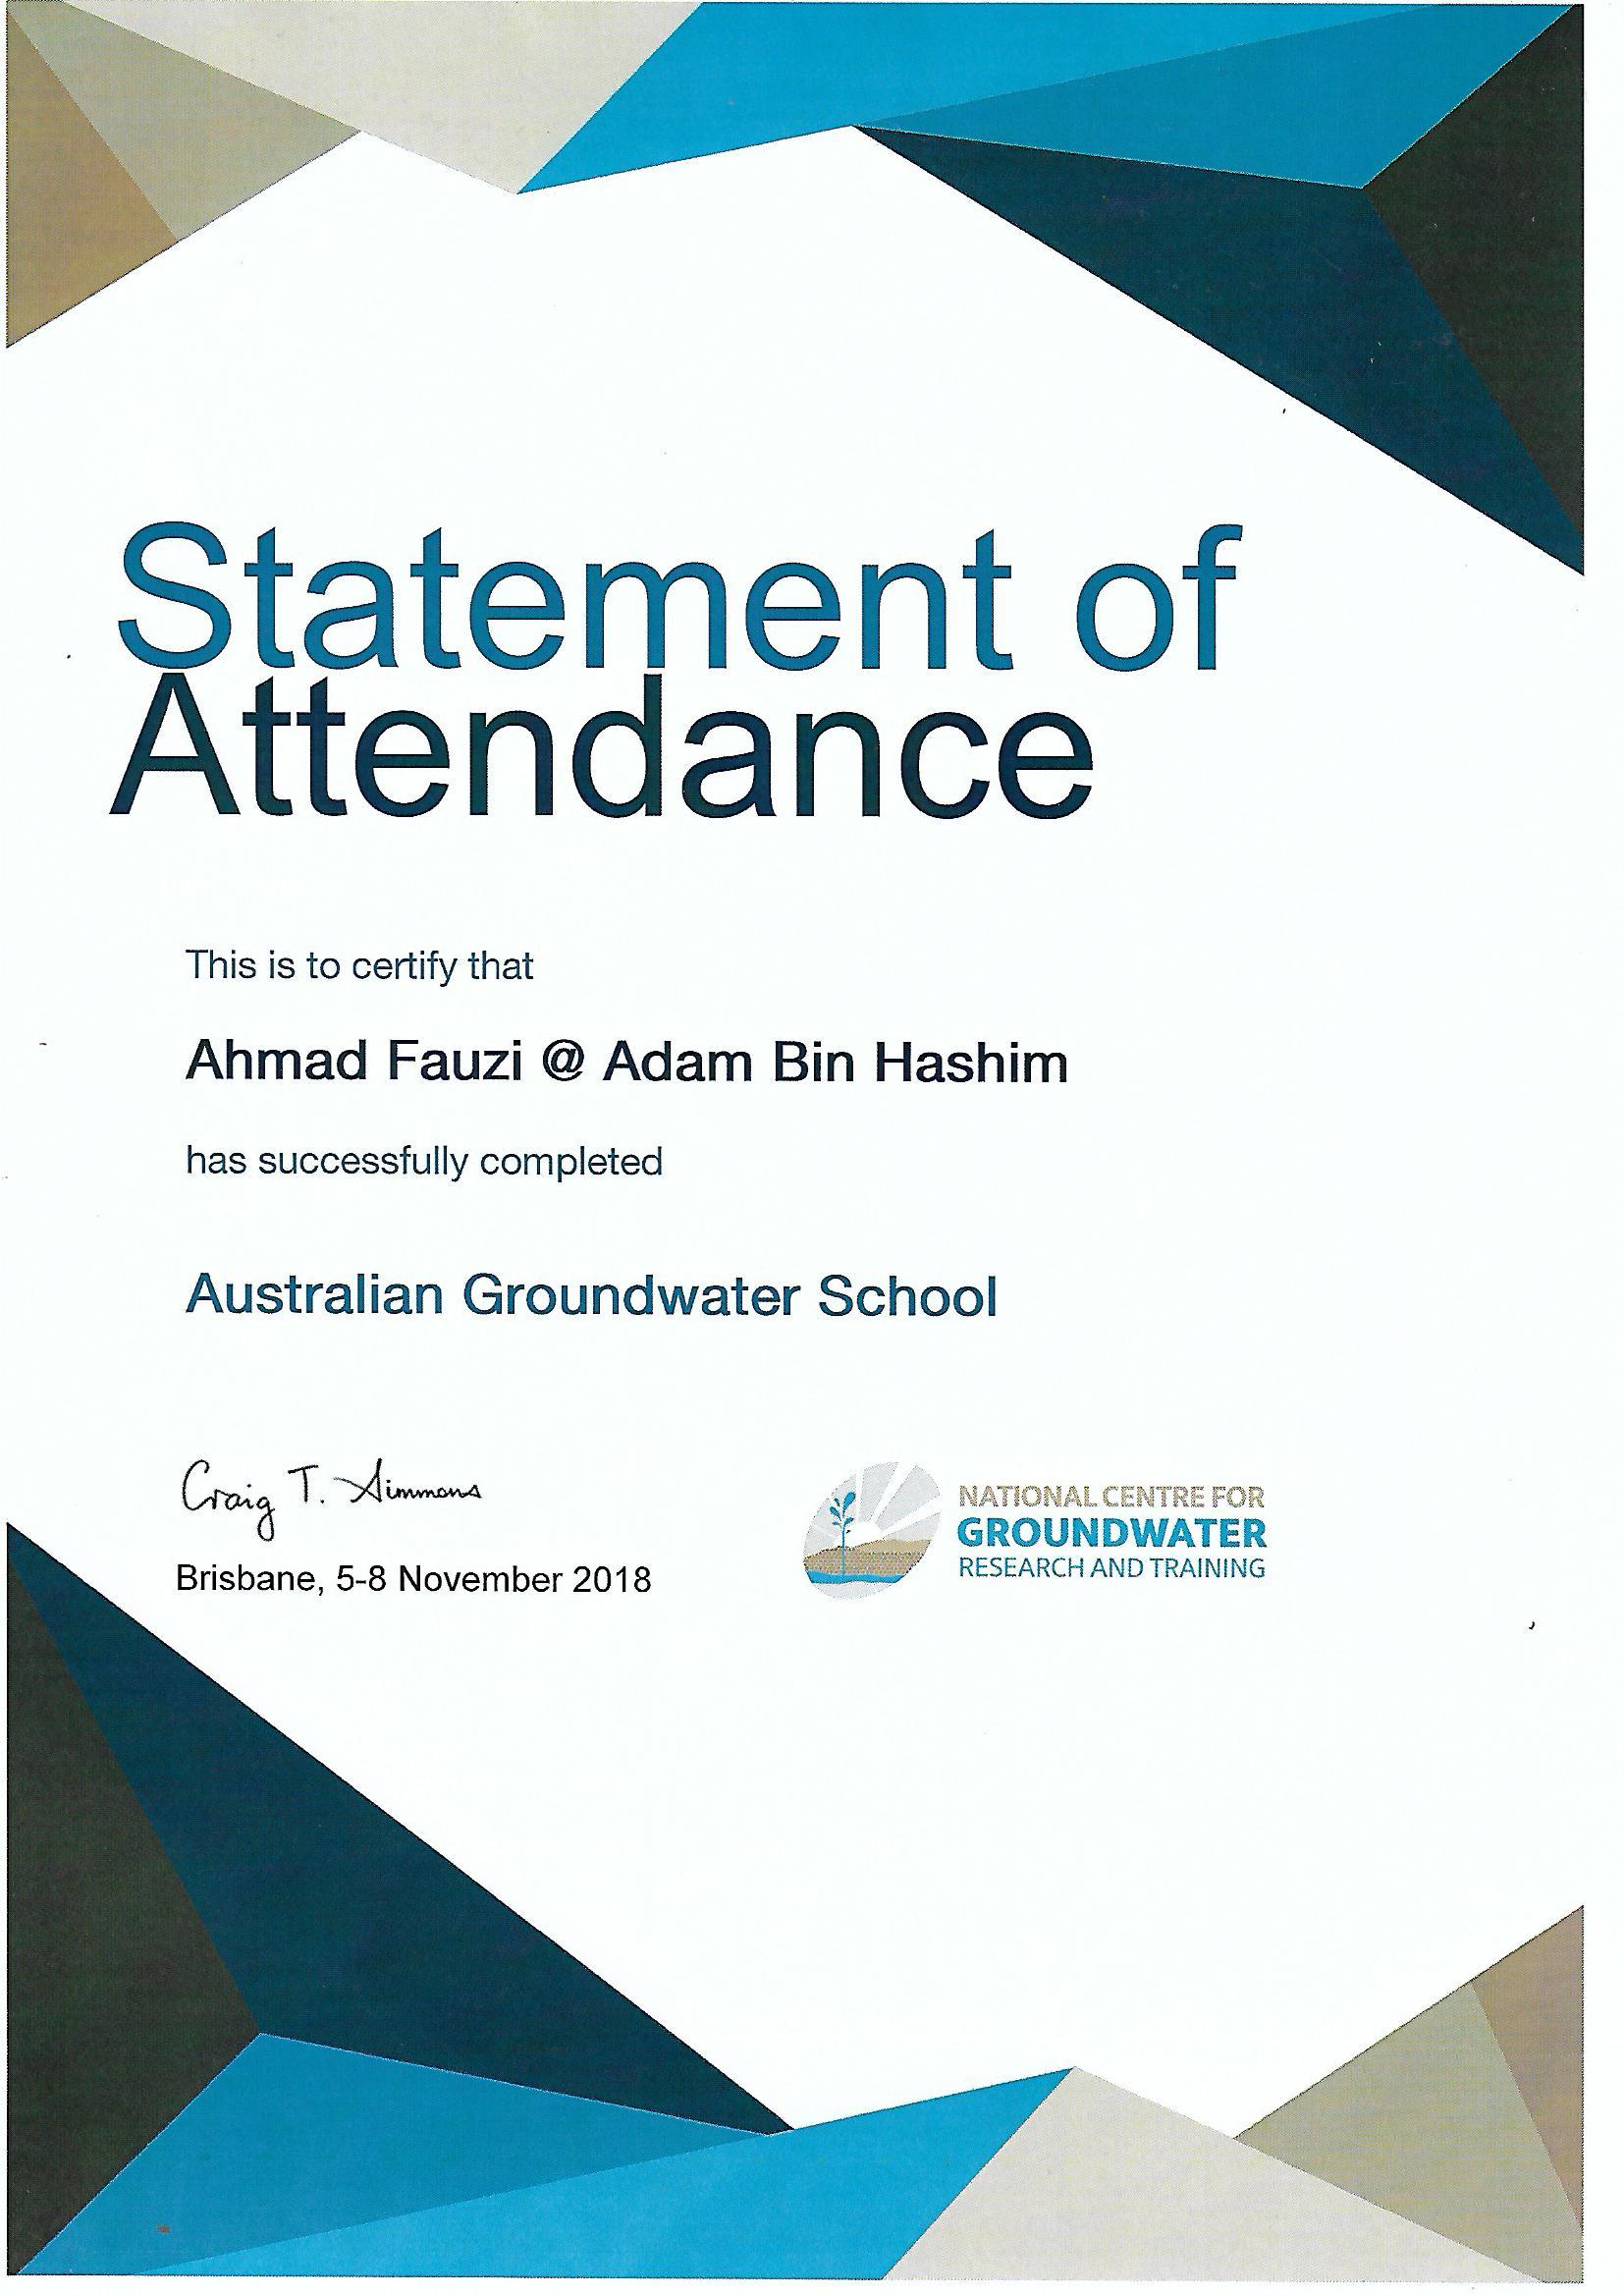 AGS Cert 2018 Brisbane